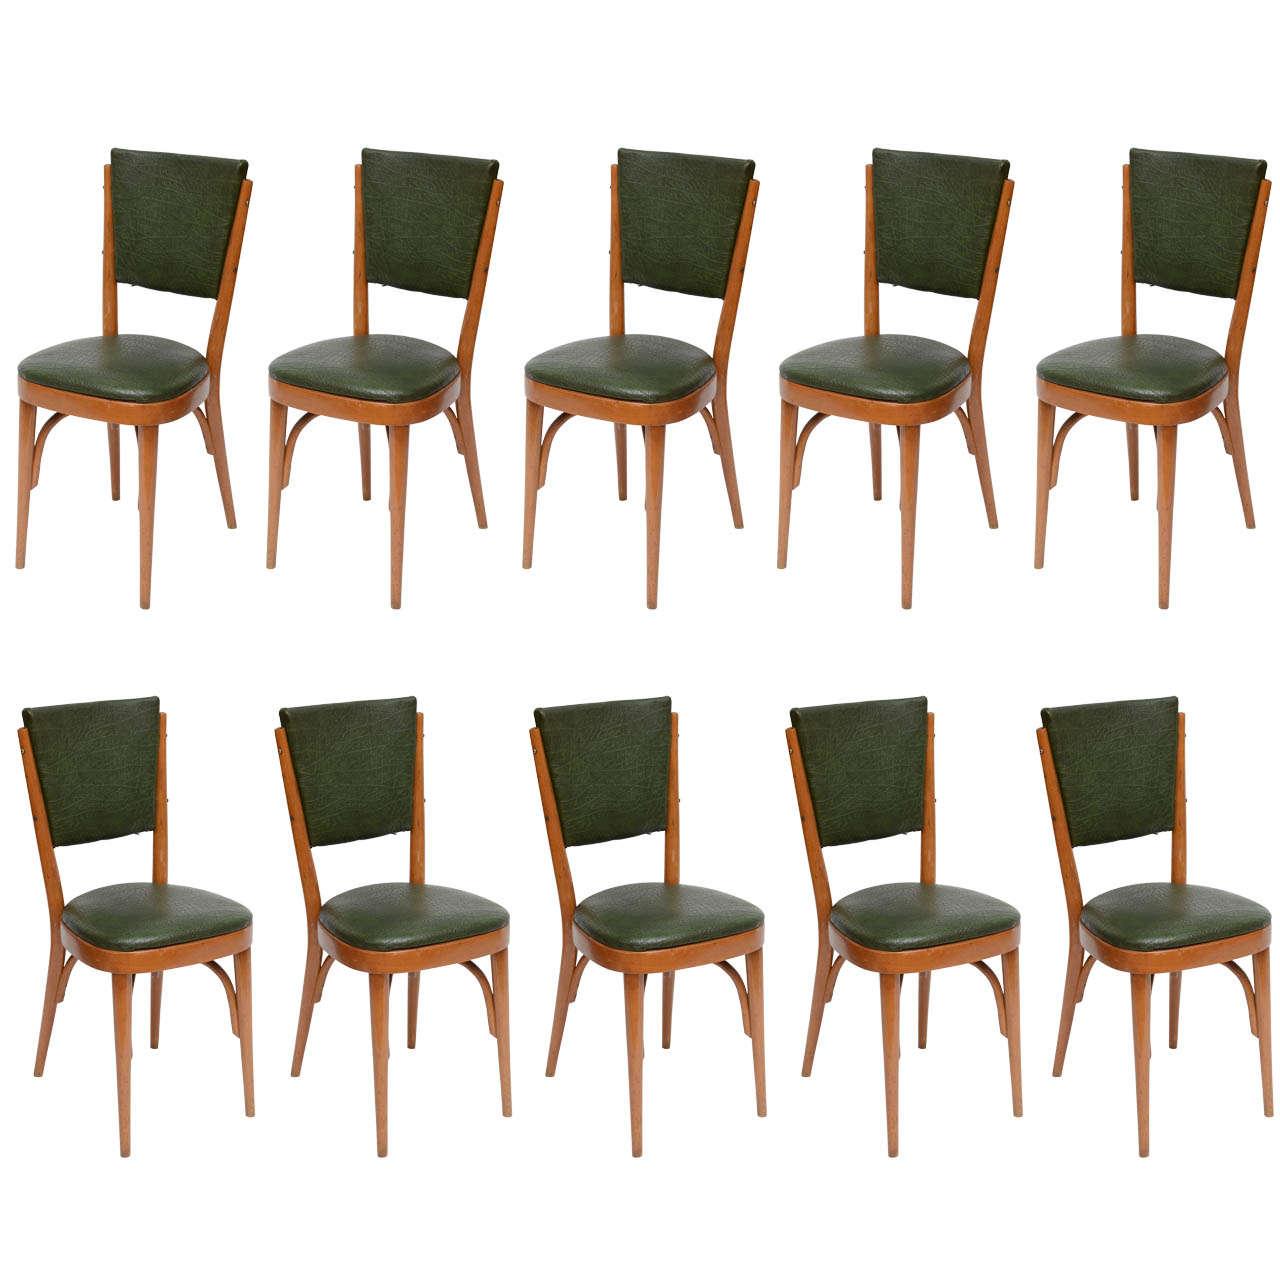 Set of Ten Italian Dining / Bistro Chairs